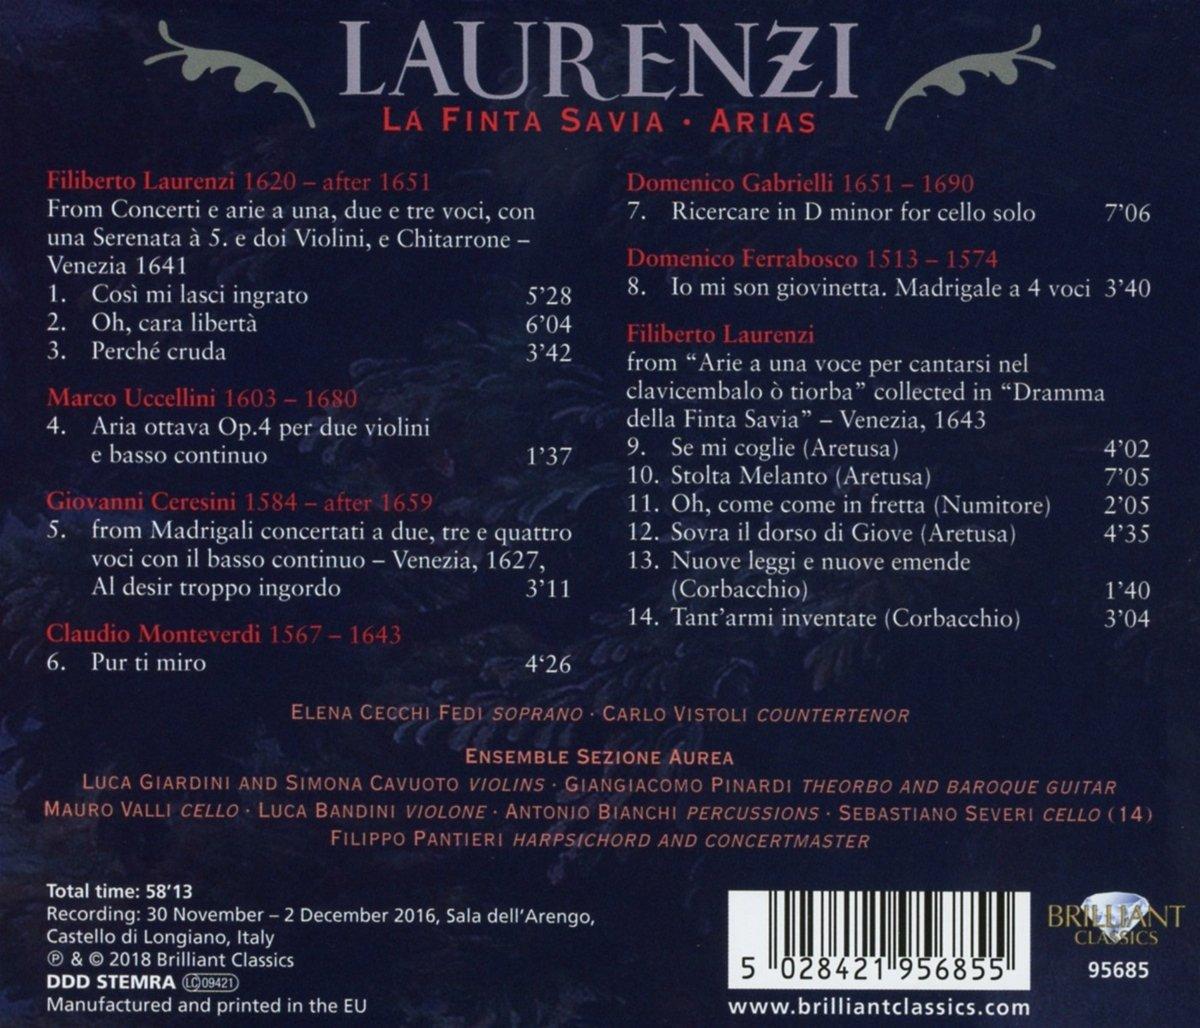 Laurenzi: La Finta Savia; Arias